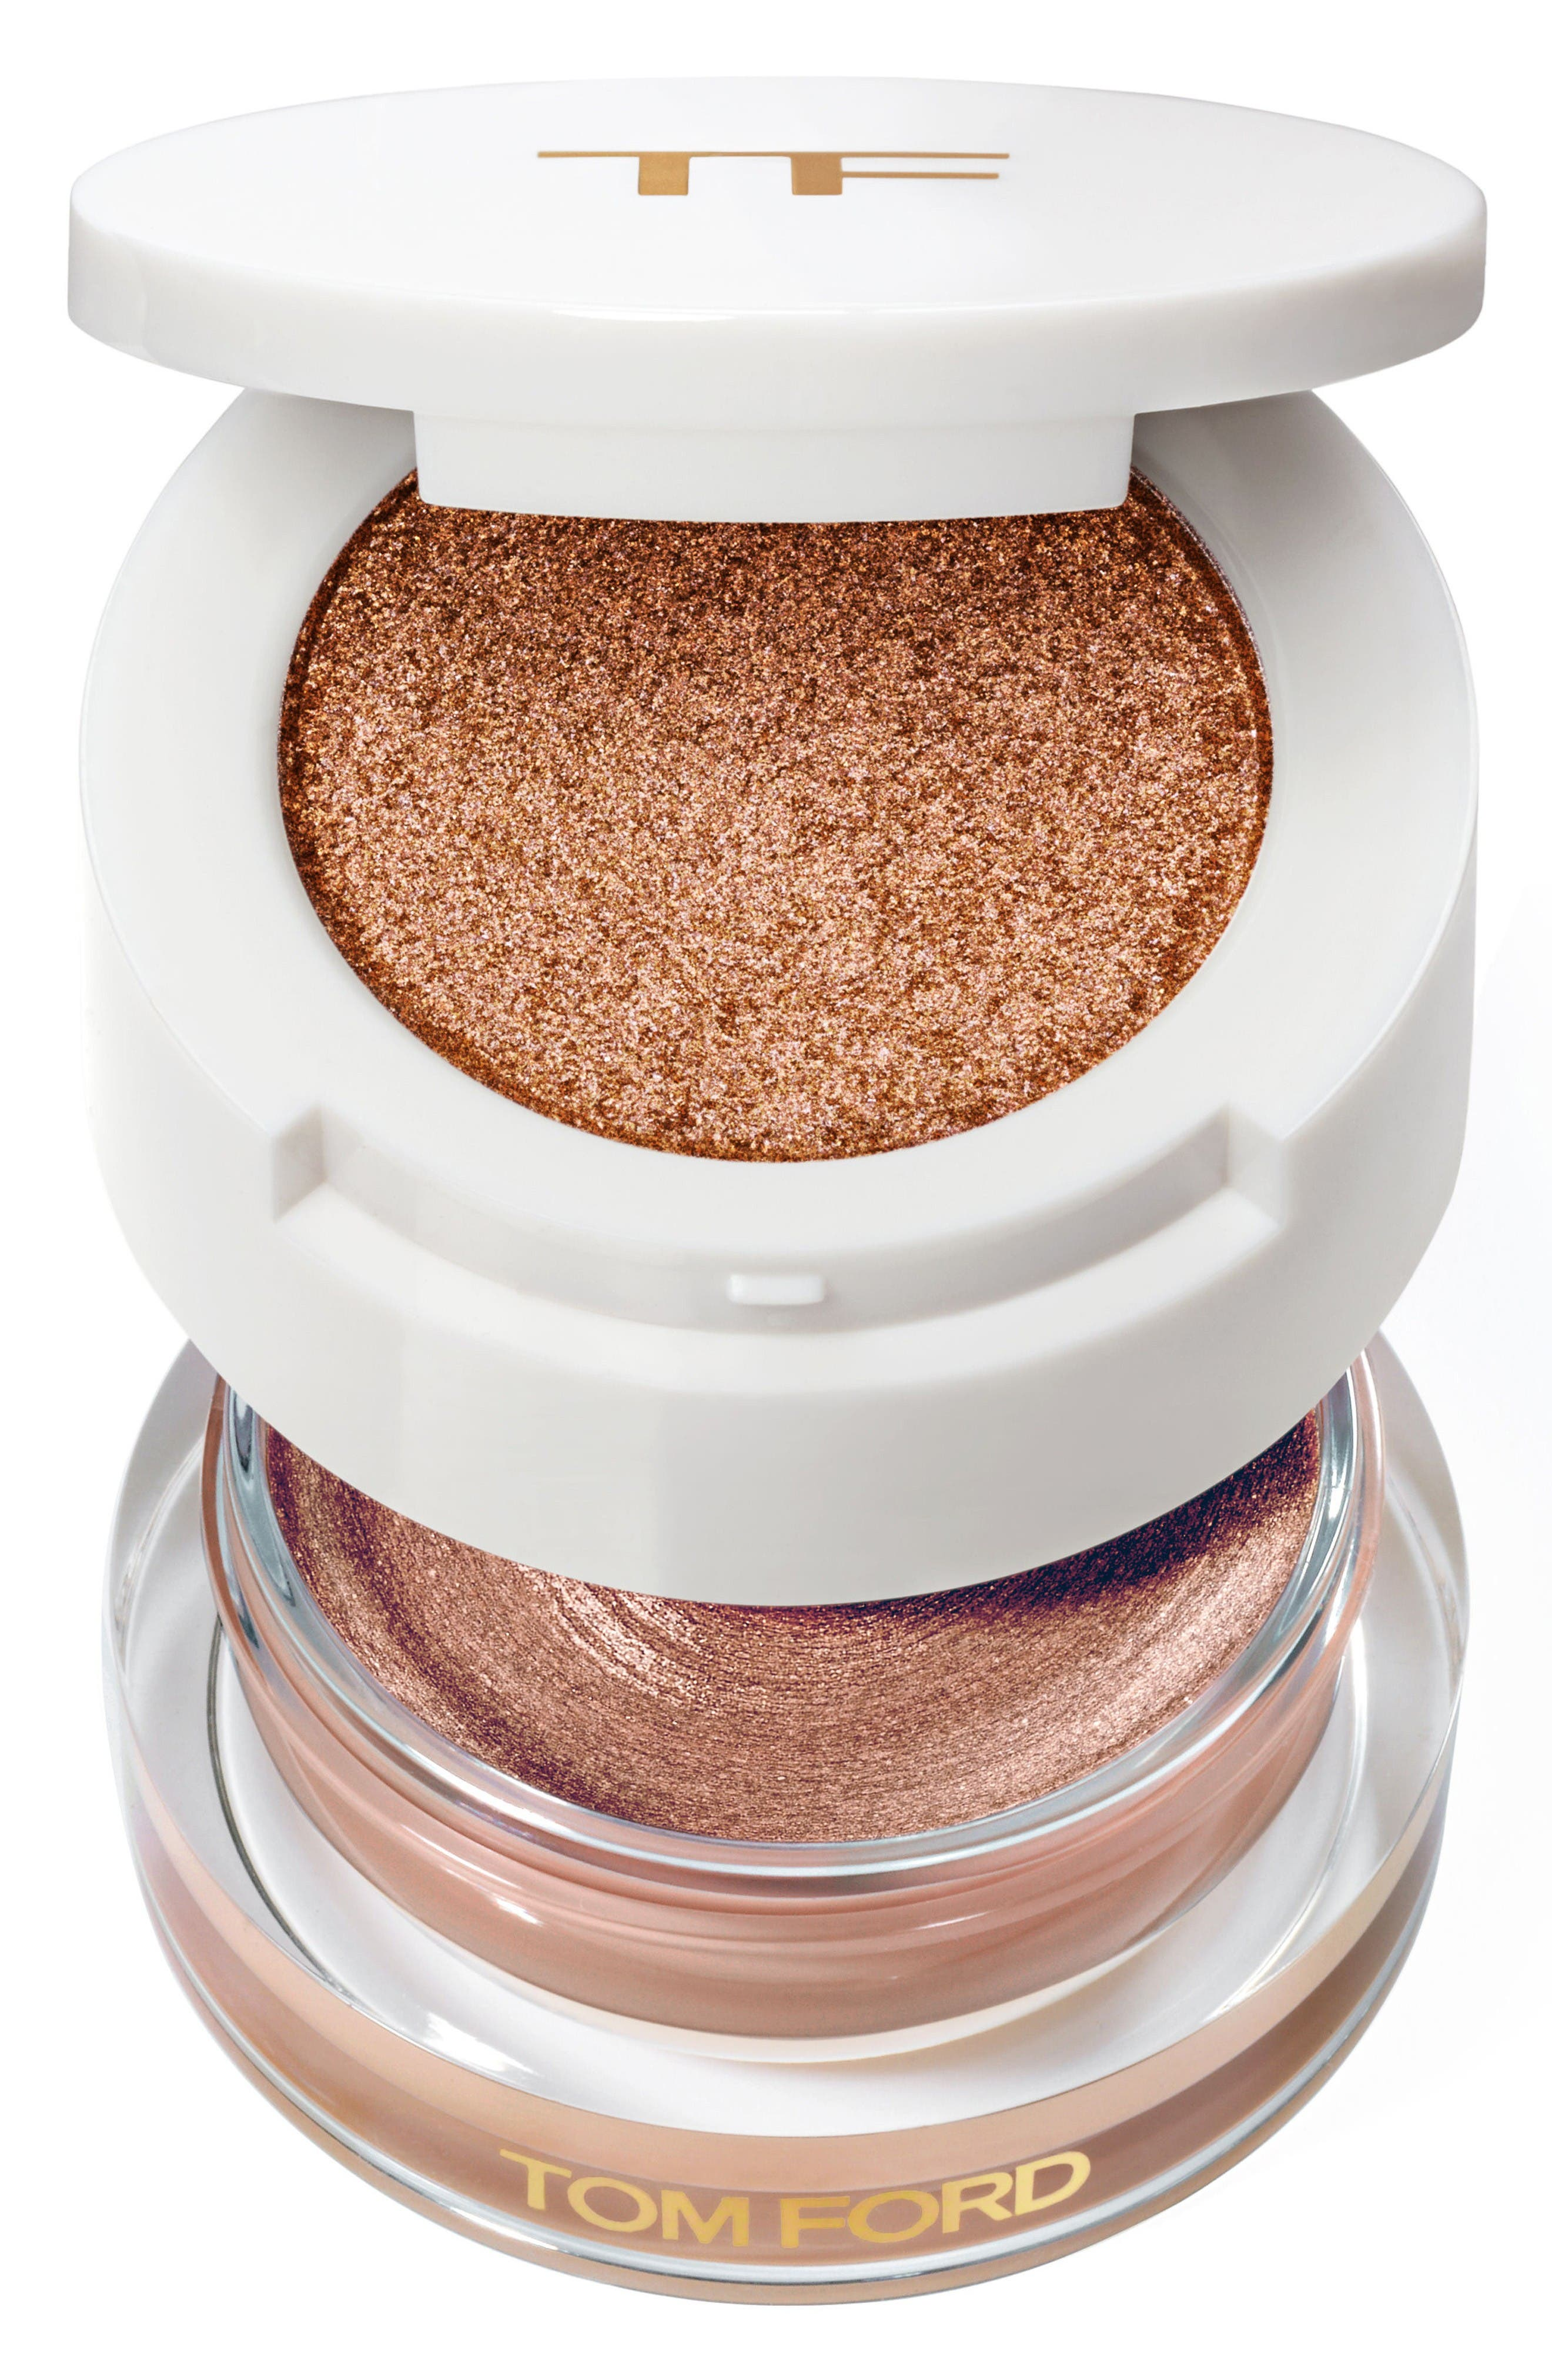 Alternate Image 1 Selected - Tom Ford Cream & Powder Eye Color